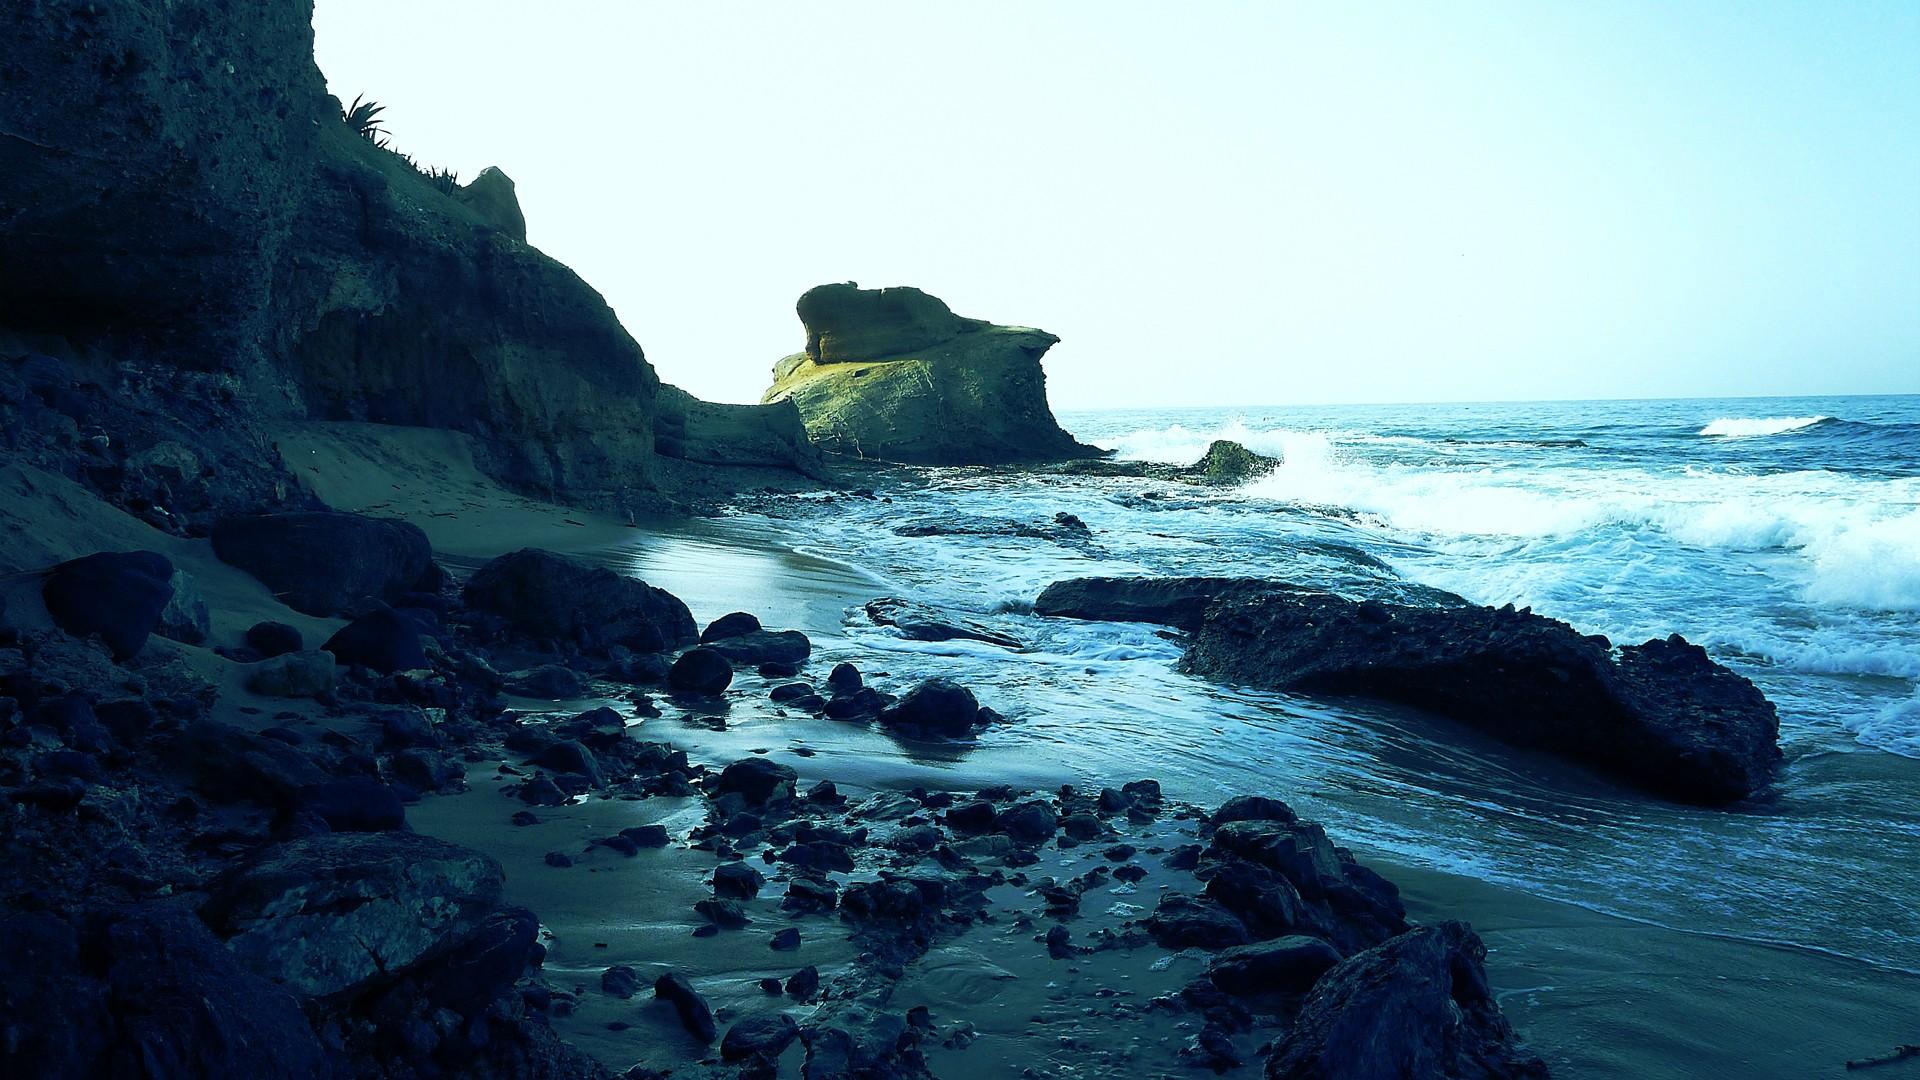 Beach Earth Rock Water 1920x1080